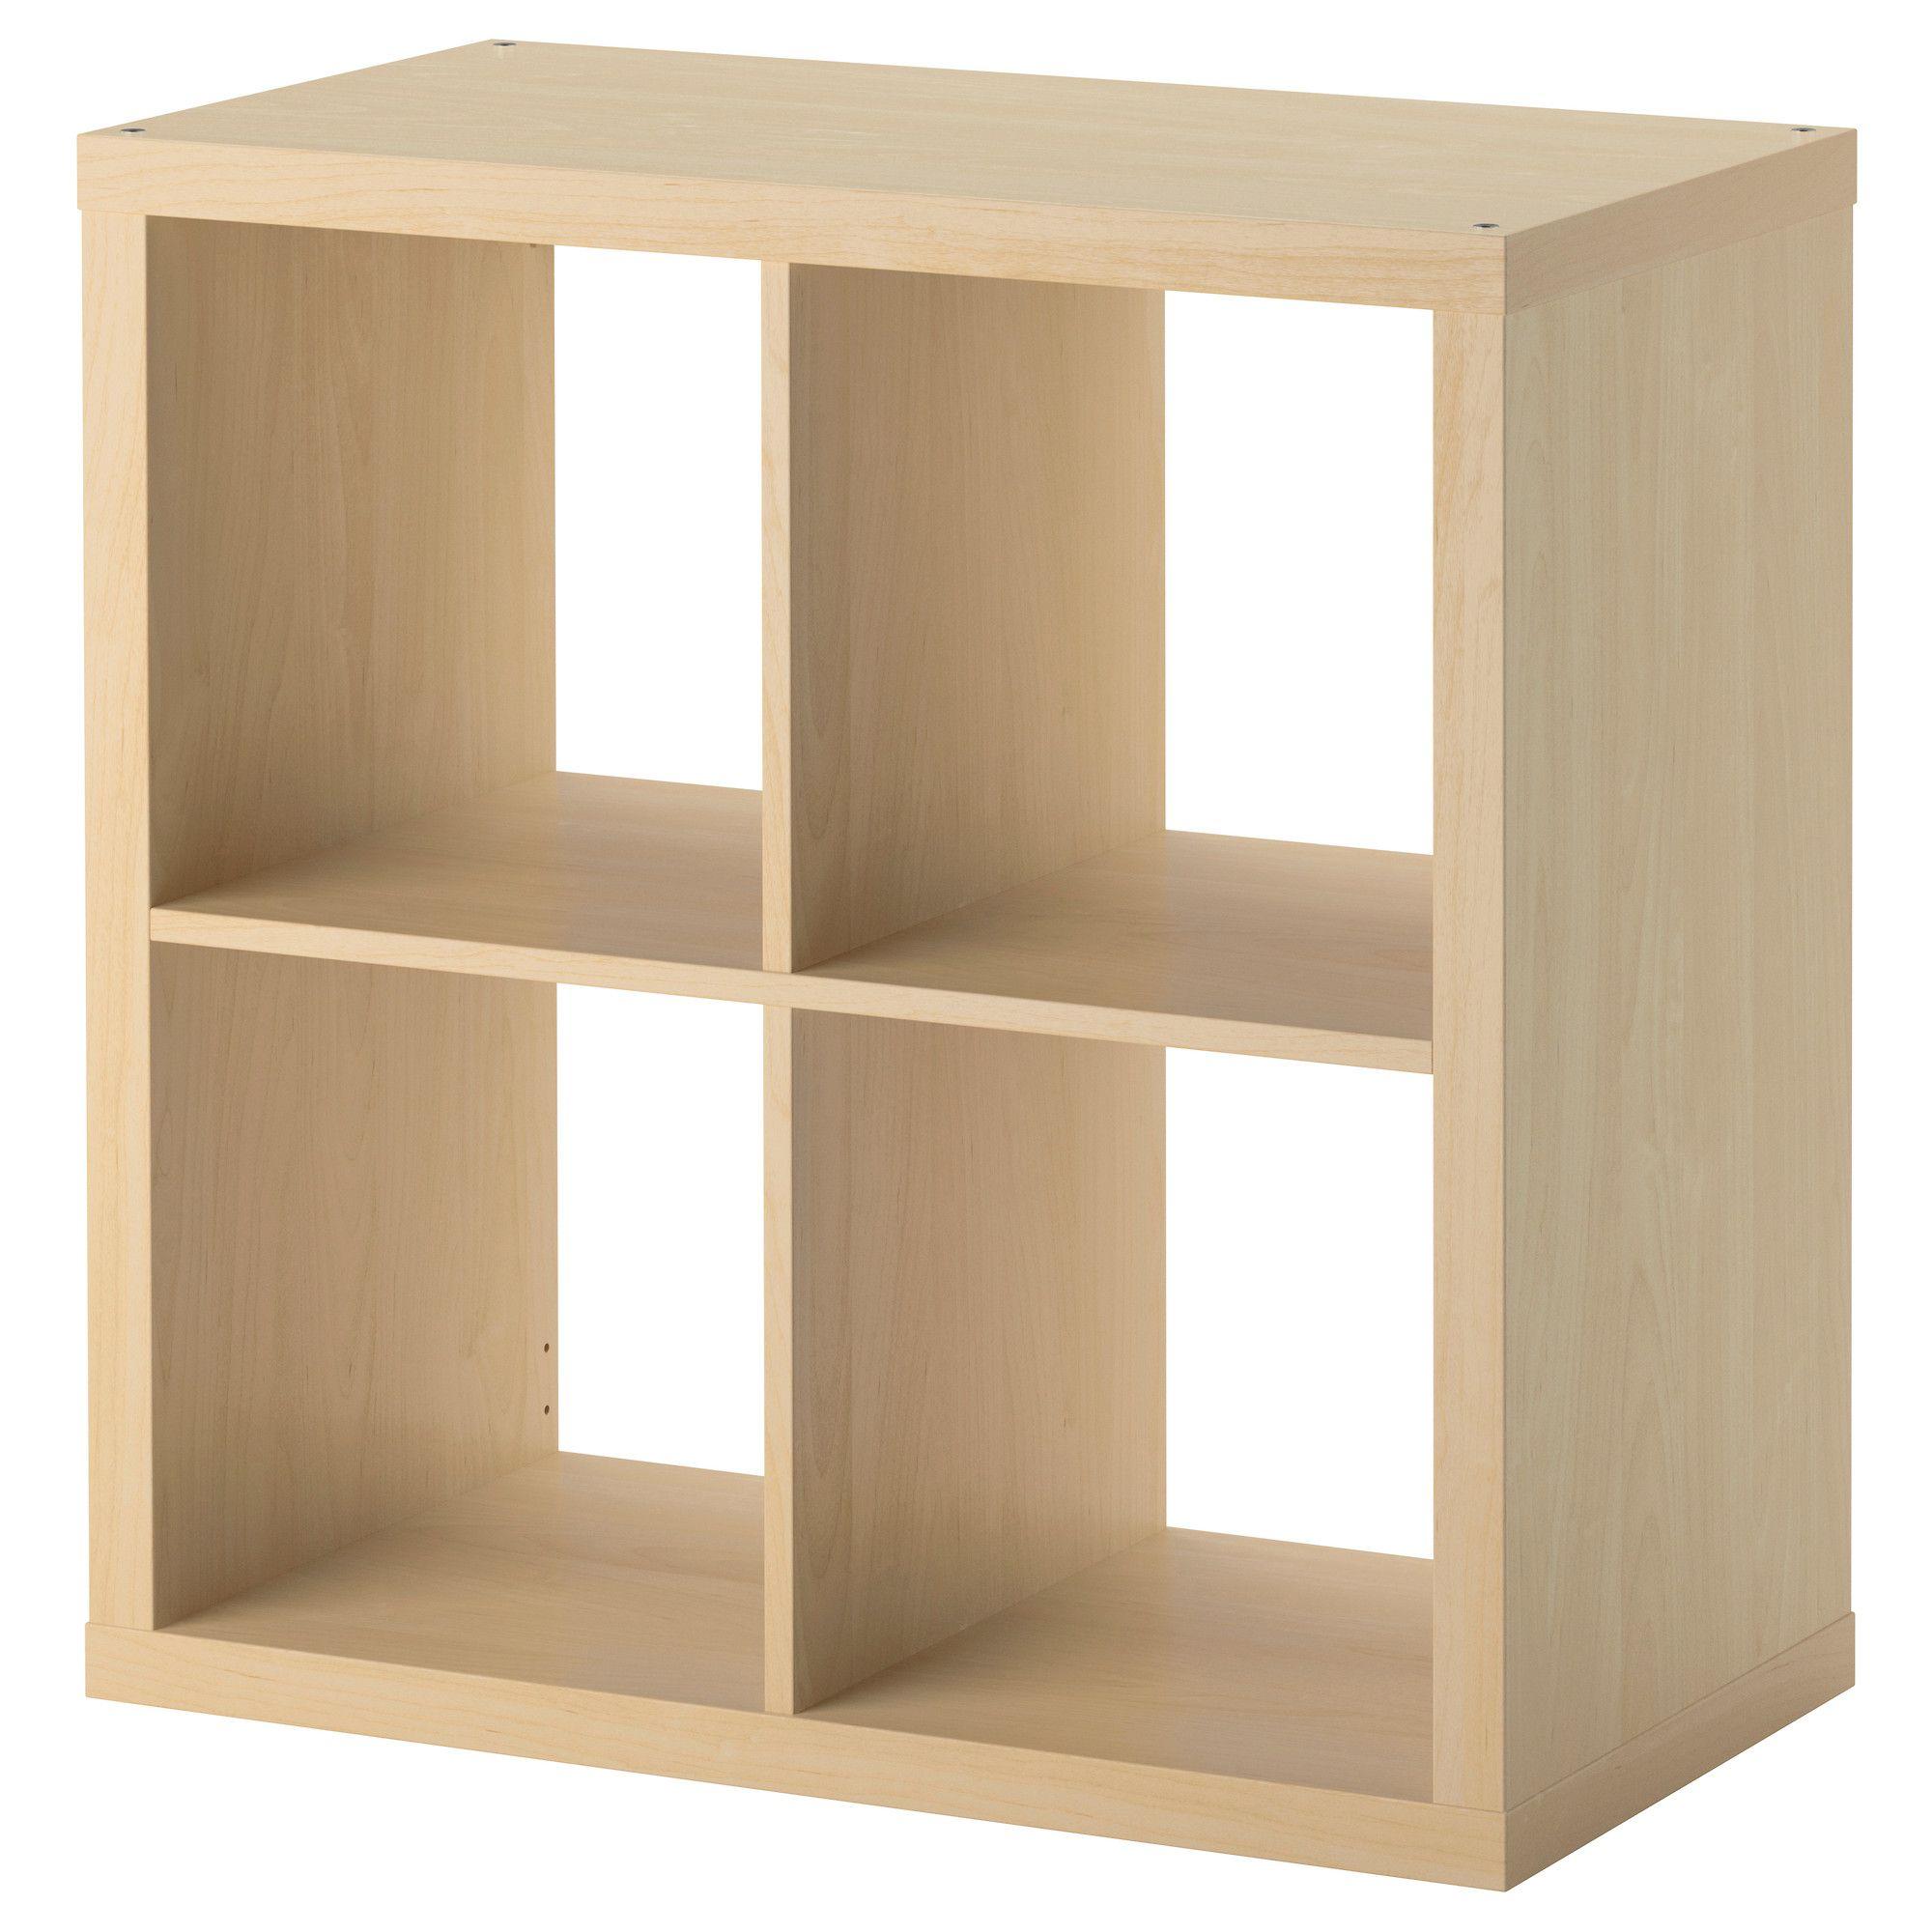 Mobilier Et Decoration Interieur Et Exterieur Ikea Kallax Kallax Ikea